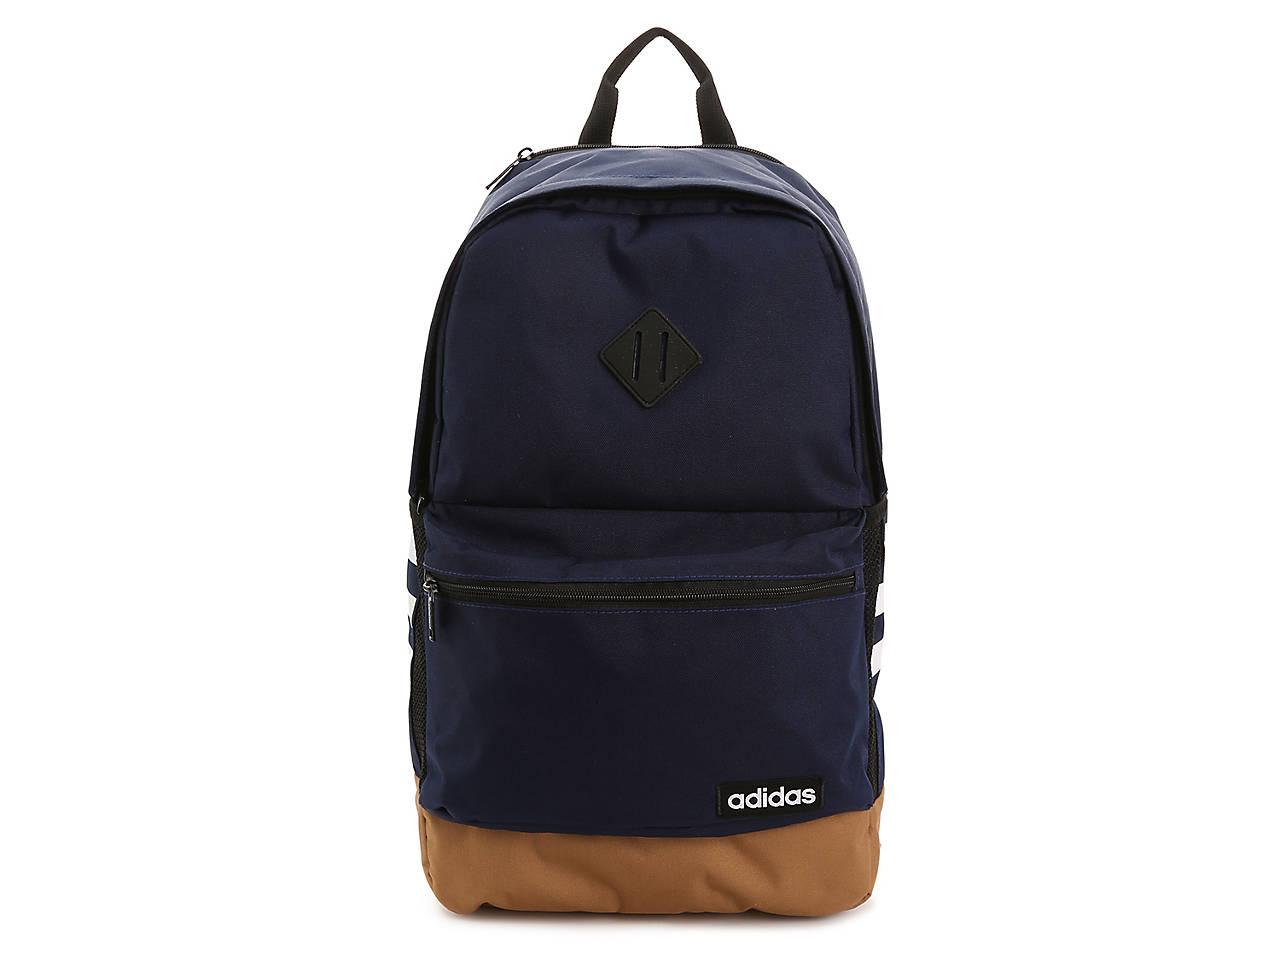 47d13f44aeff adidas Classic Backpack Men s Handbags   Accessories